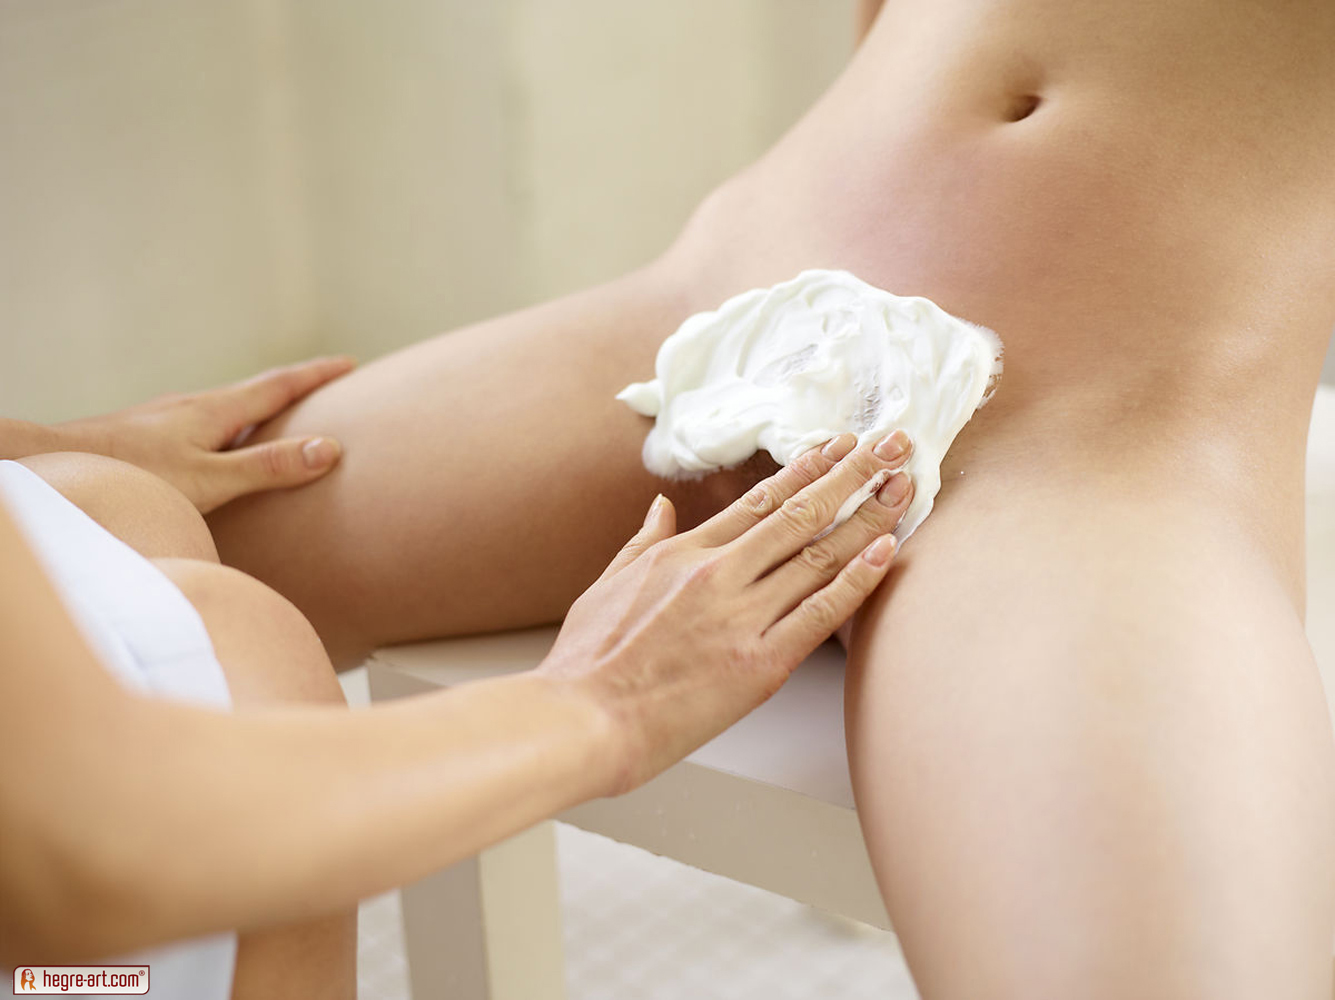 Milet cryrus nude